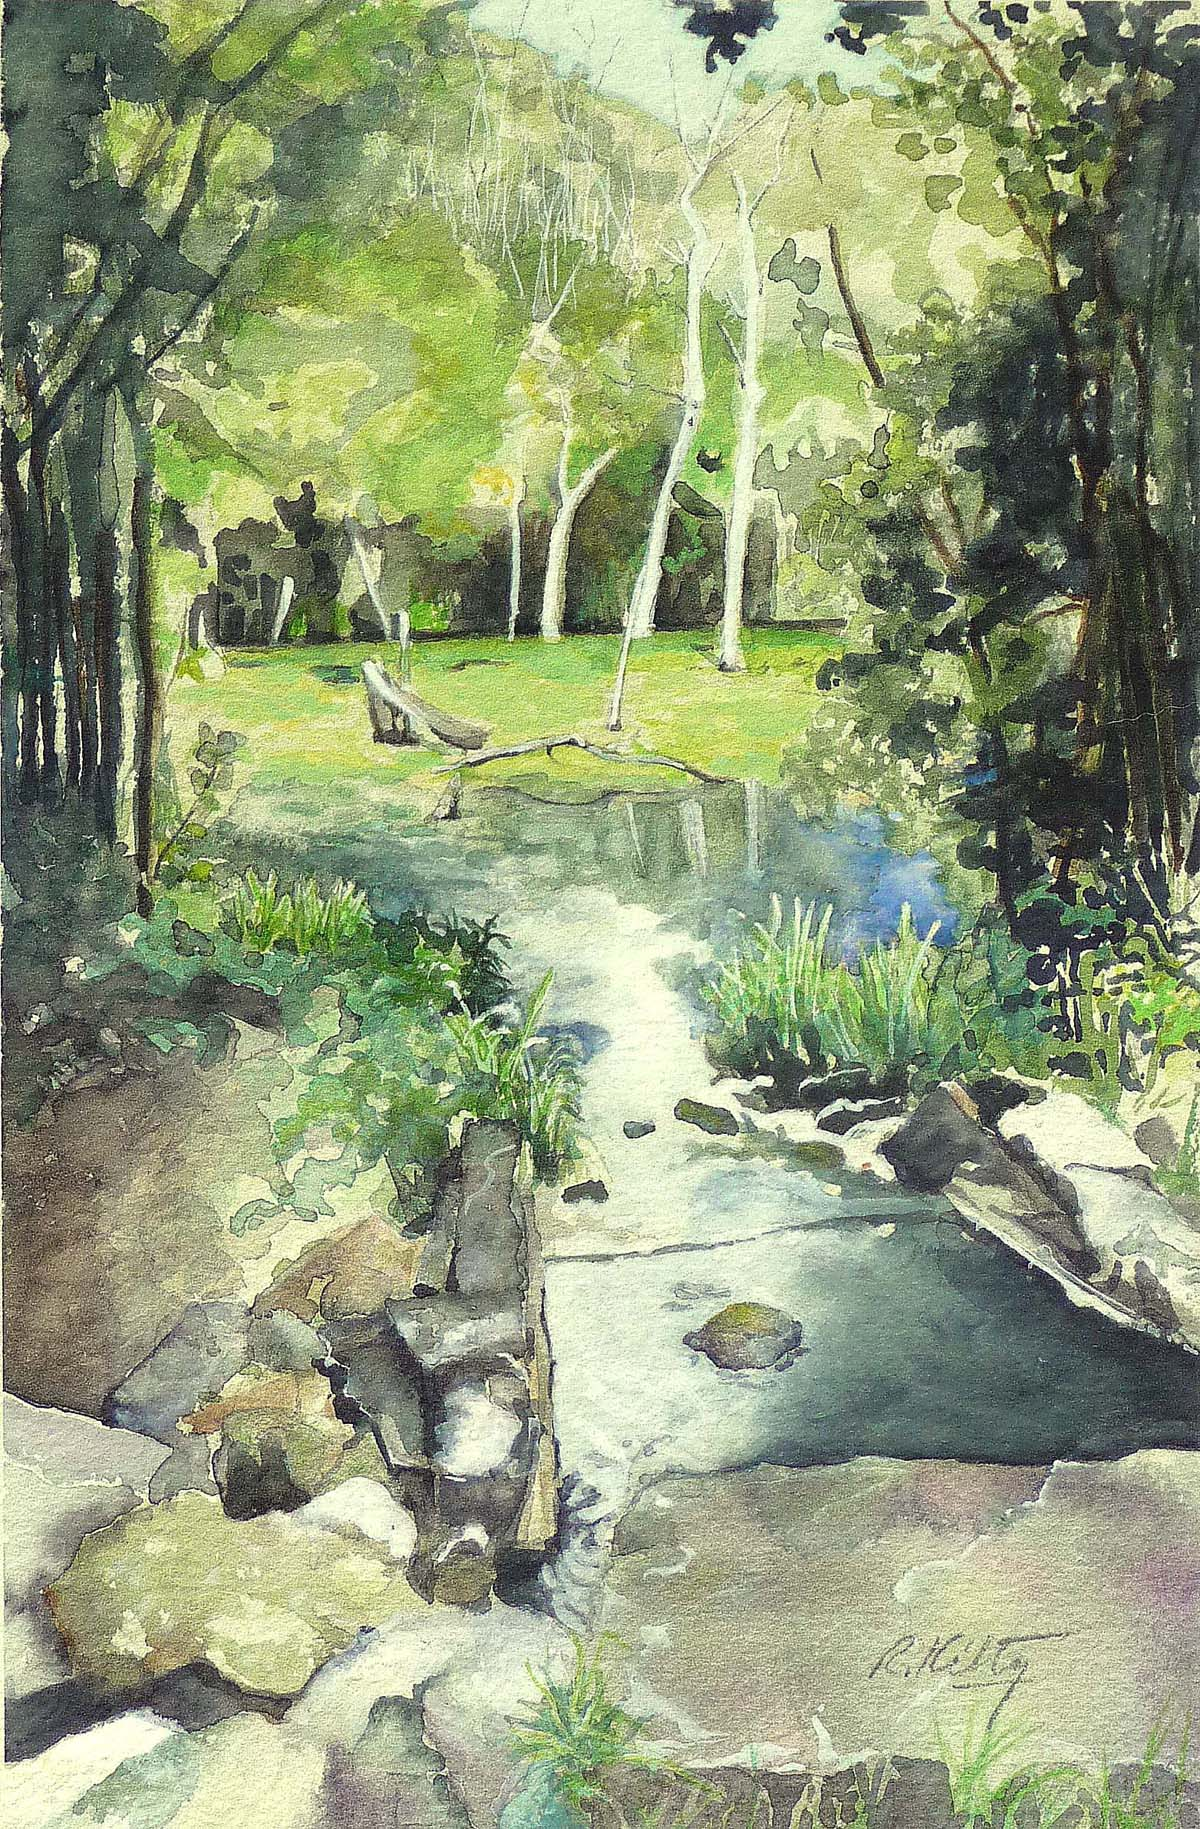 Inlet | Bobbi Kilty | Fine Artist